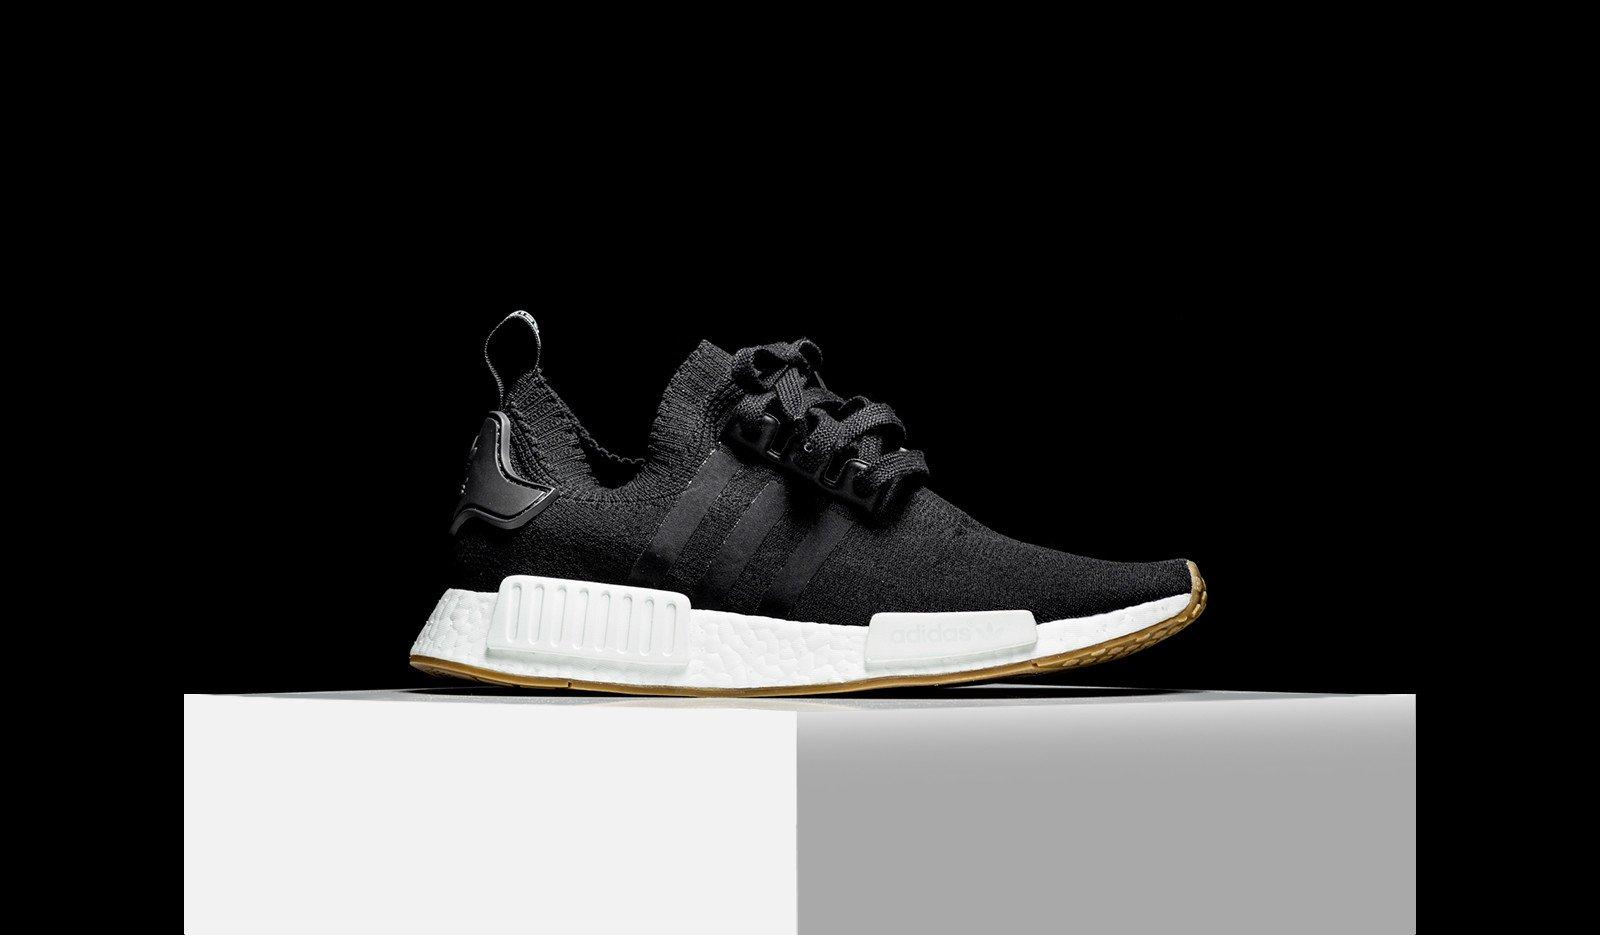 Restock Adidas Nmd R1 Primeknit Black Gum Sneaker Shouts